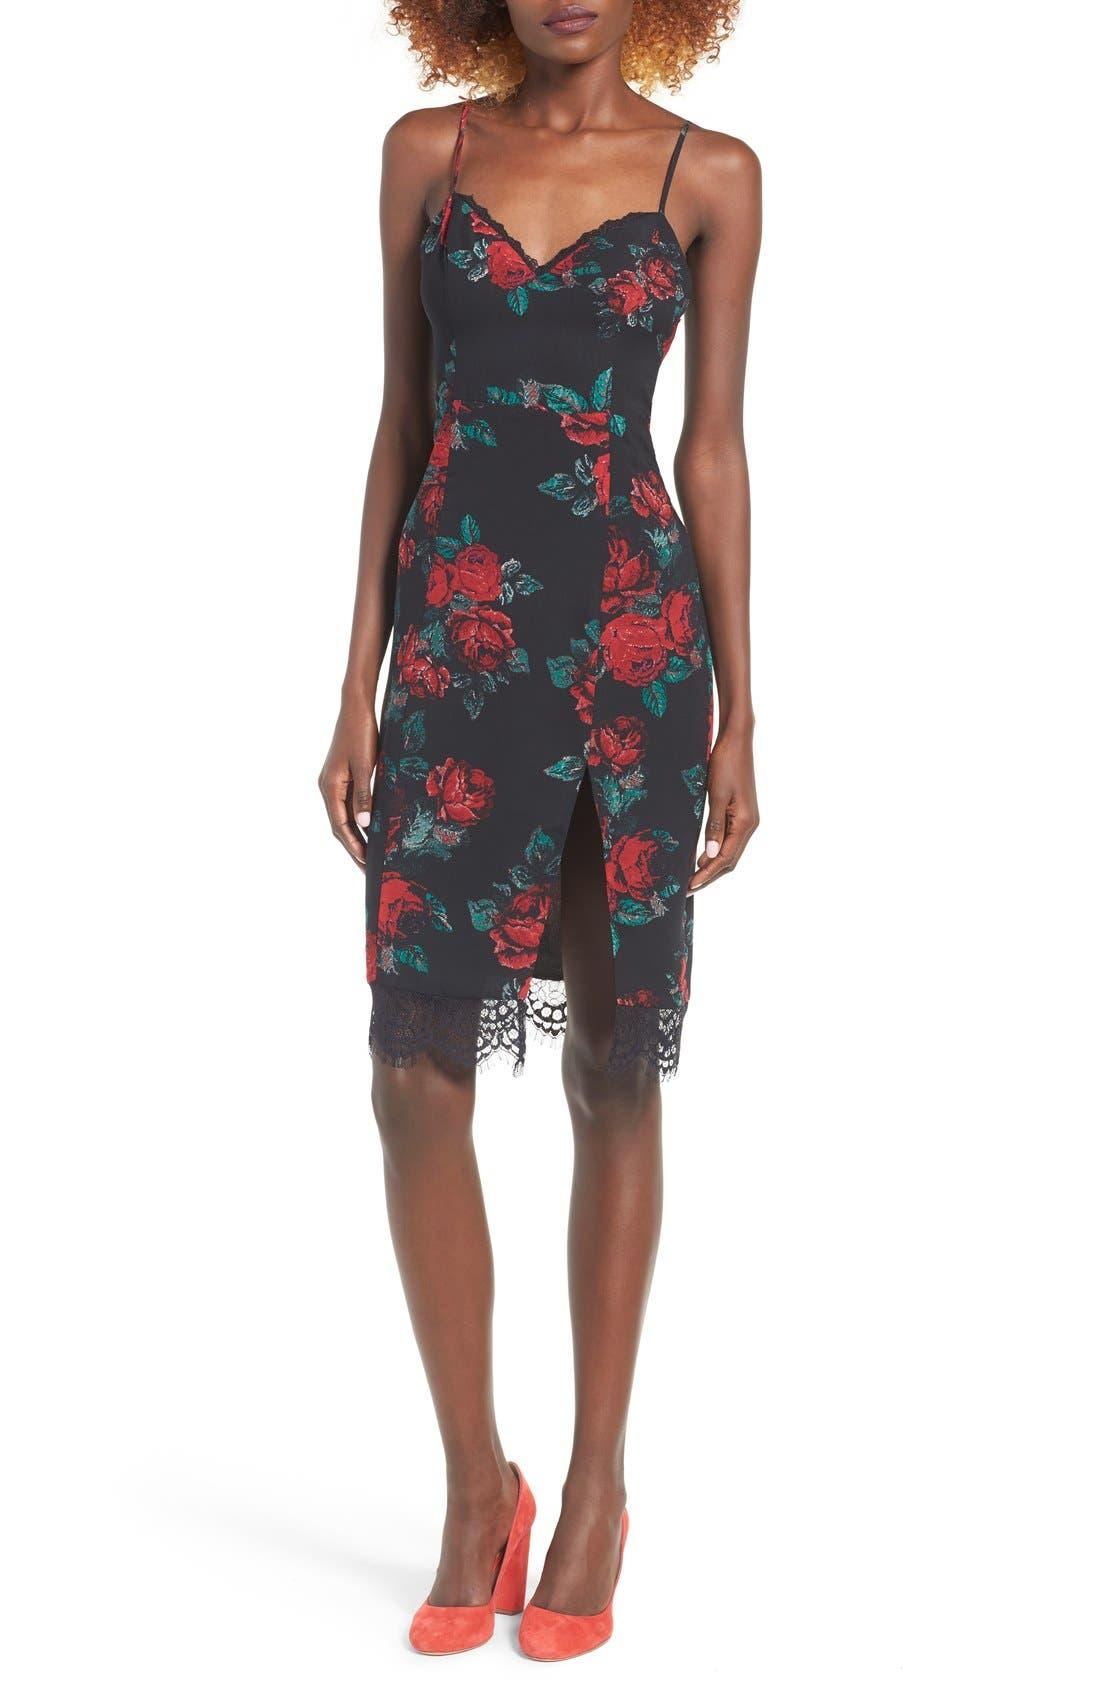 Honeymoon Dress, Main, color, 690